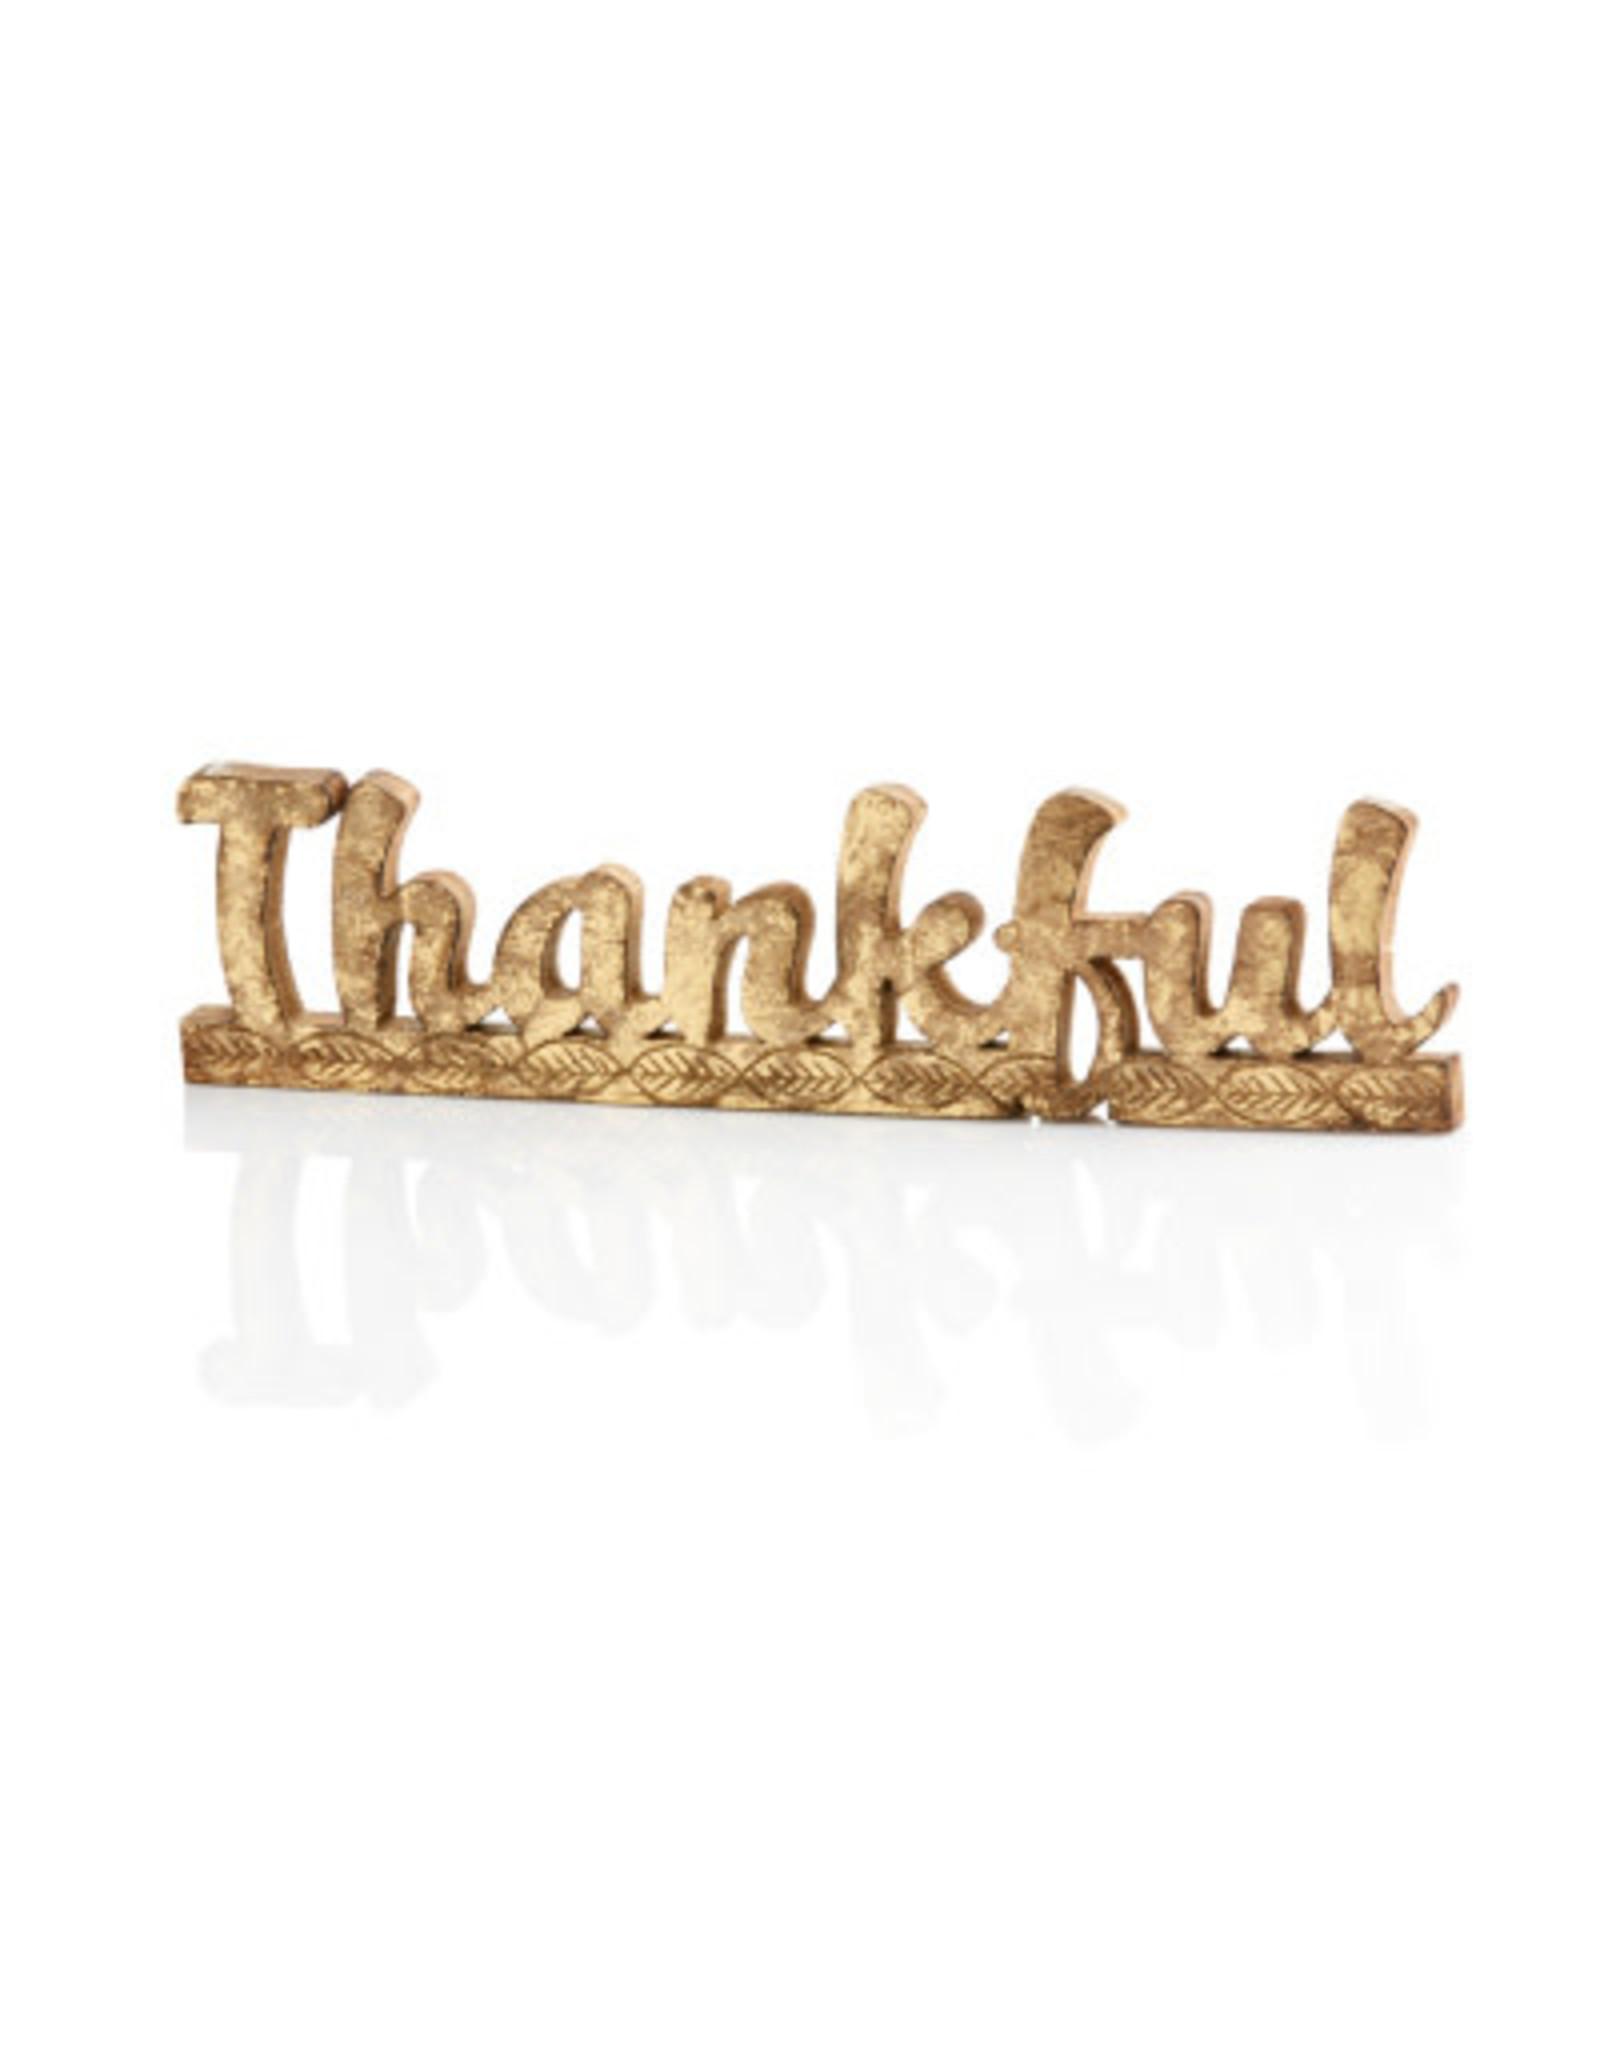 Thankful Word Art, India